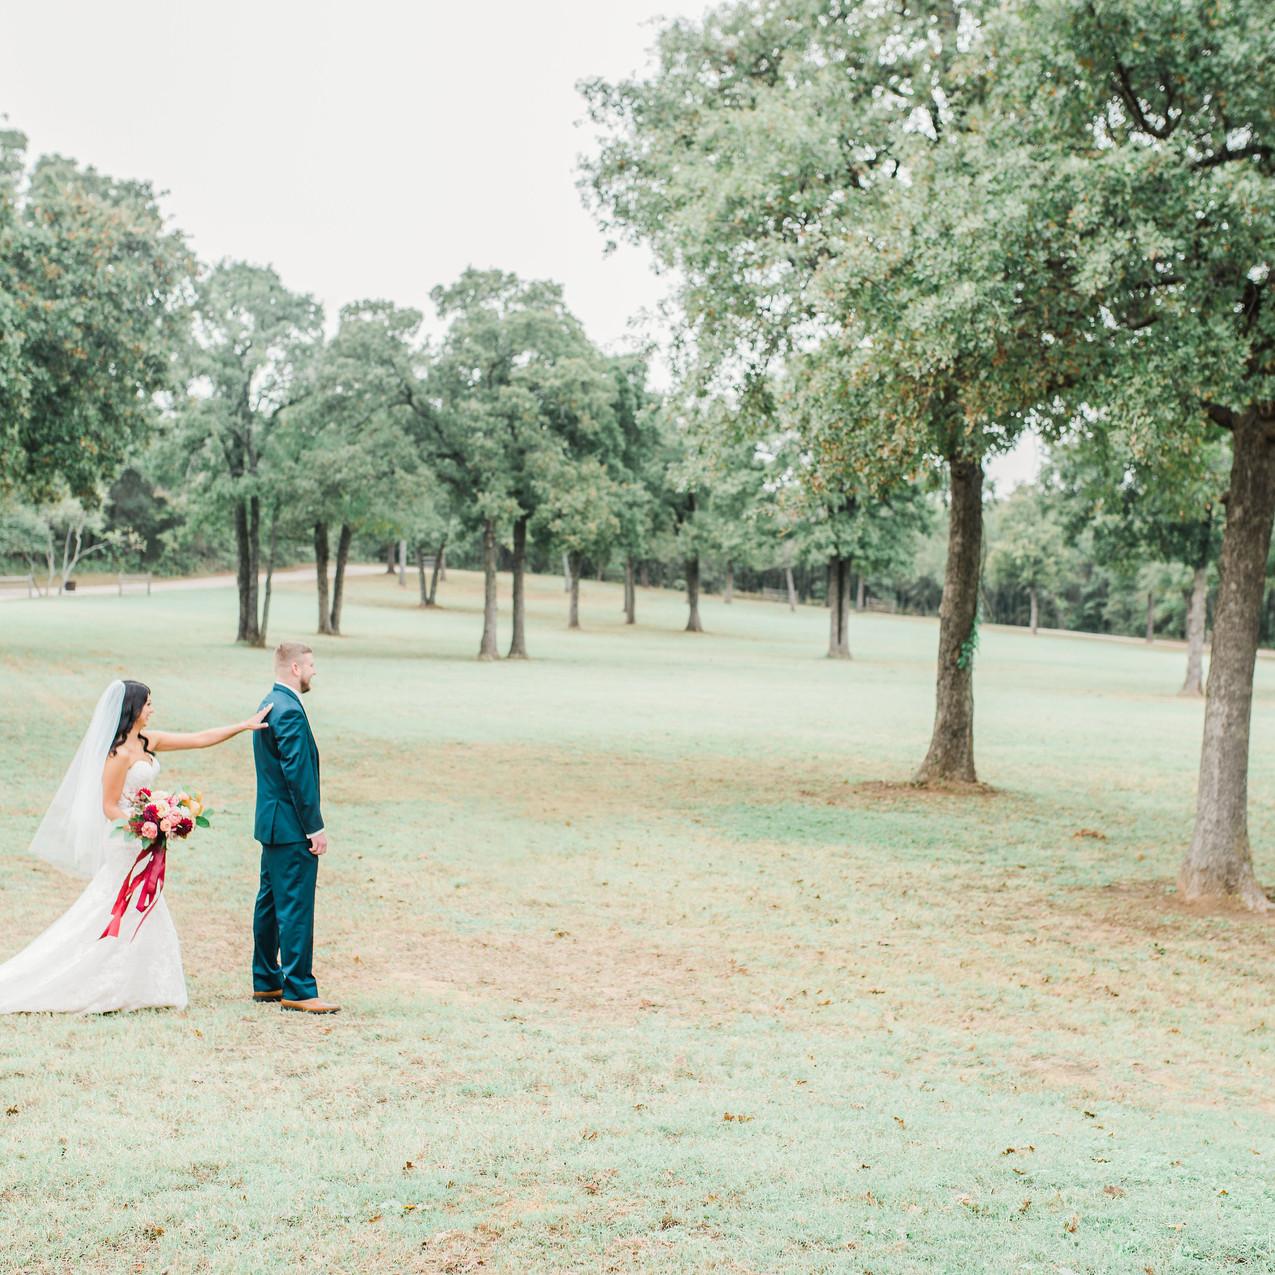 The_Grove_Aubrey_Wedding_Sheena+Justin027